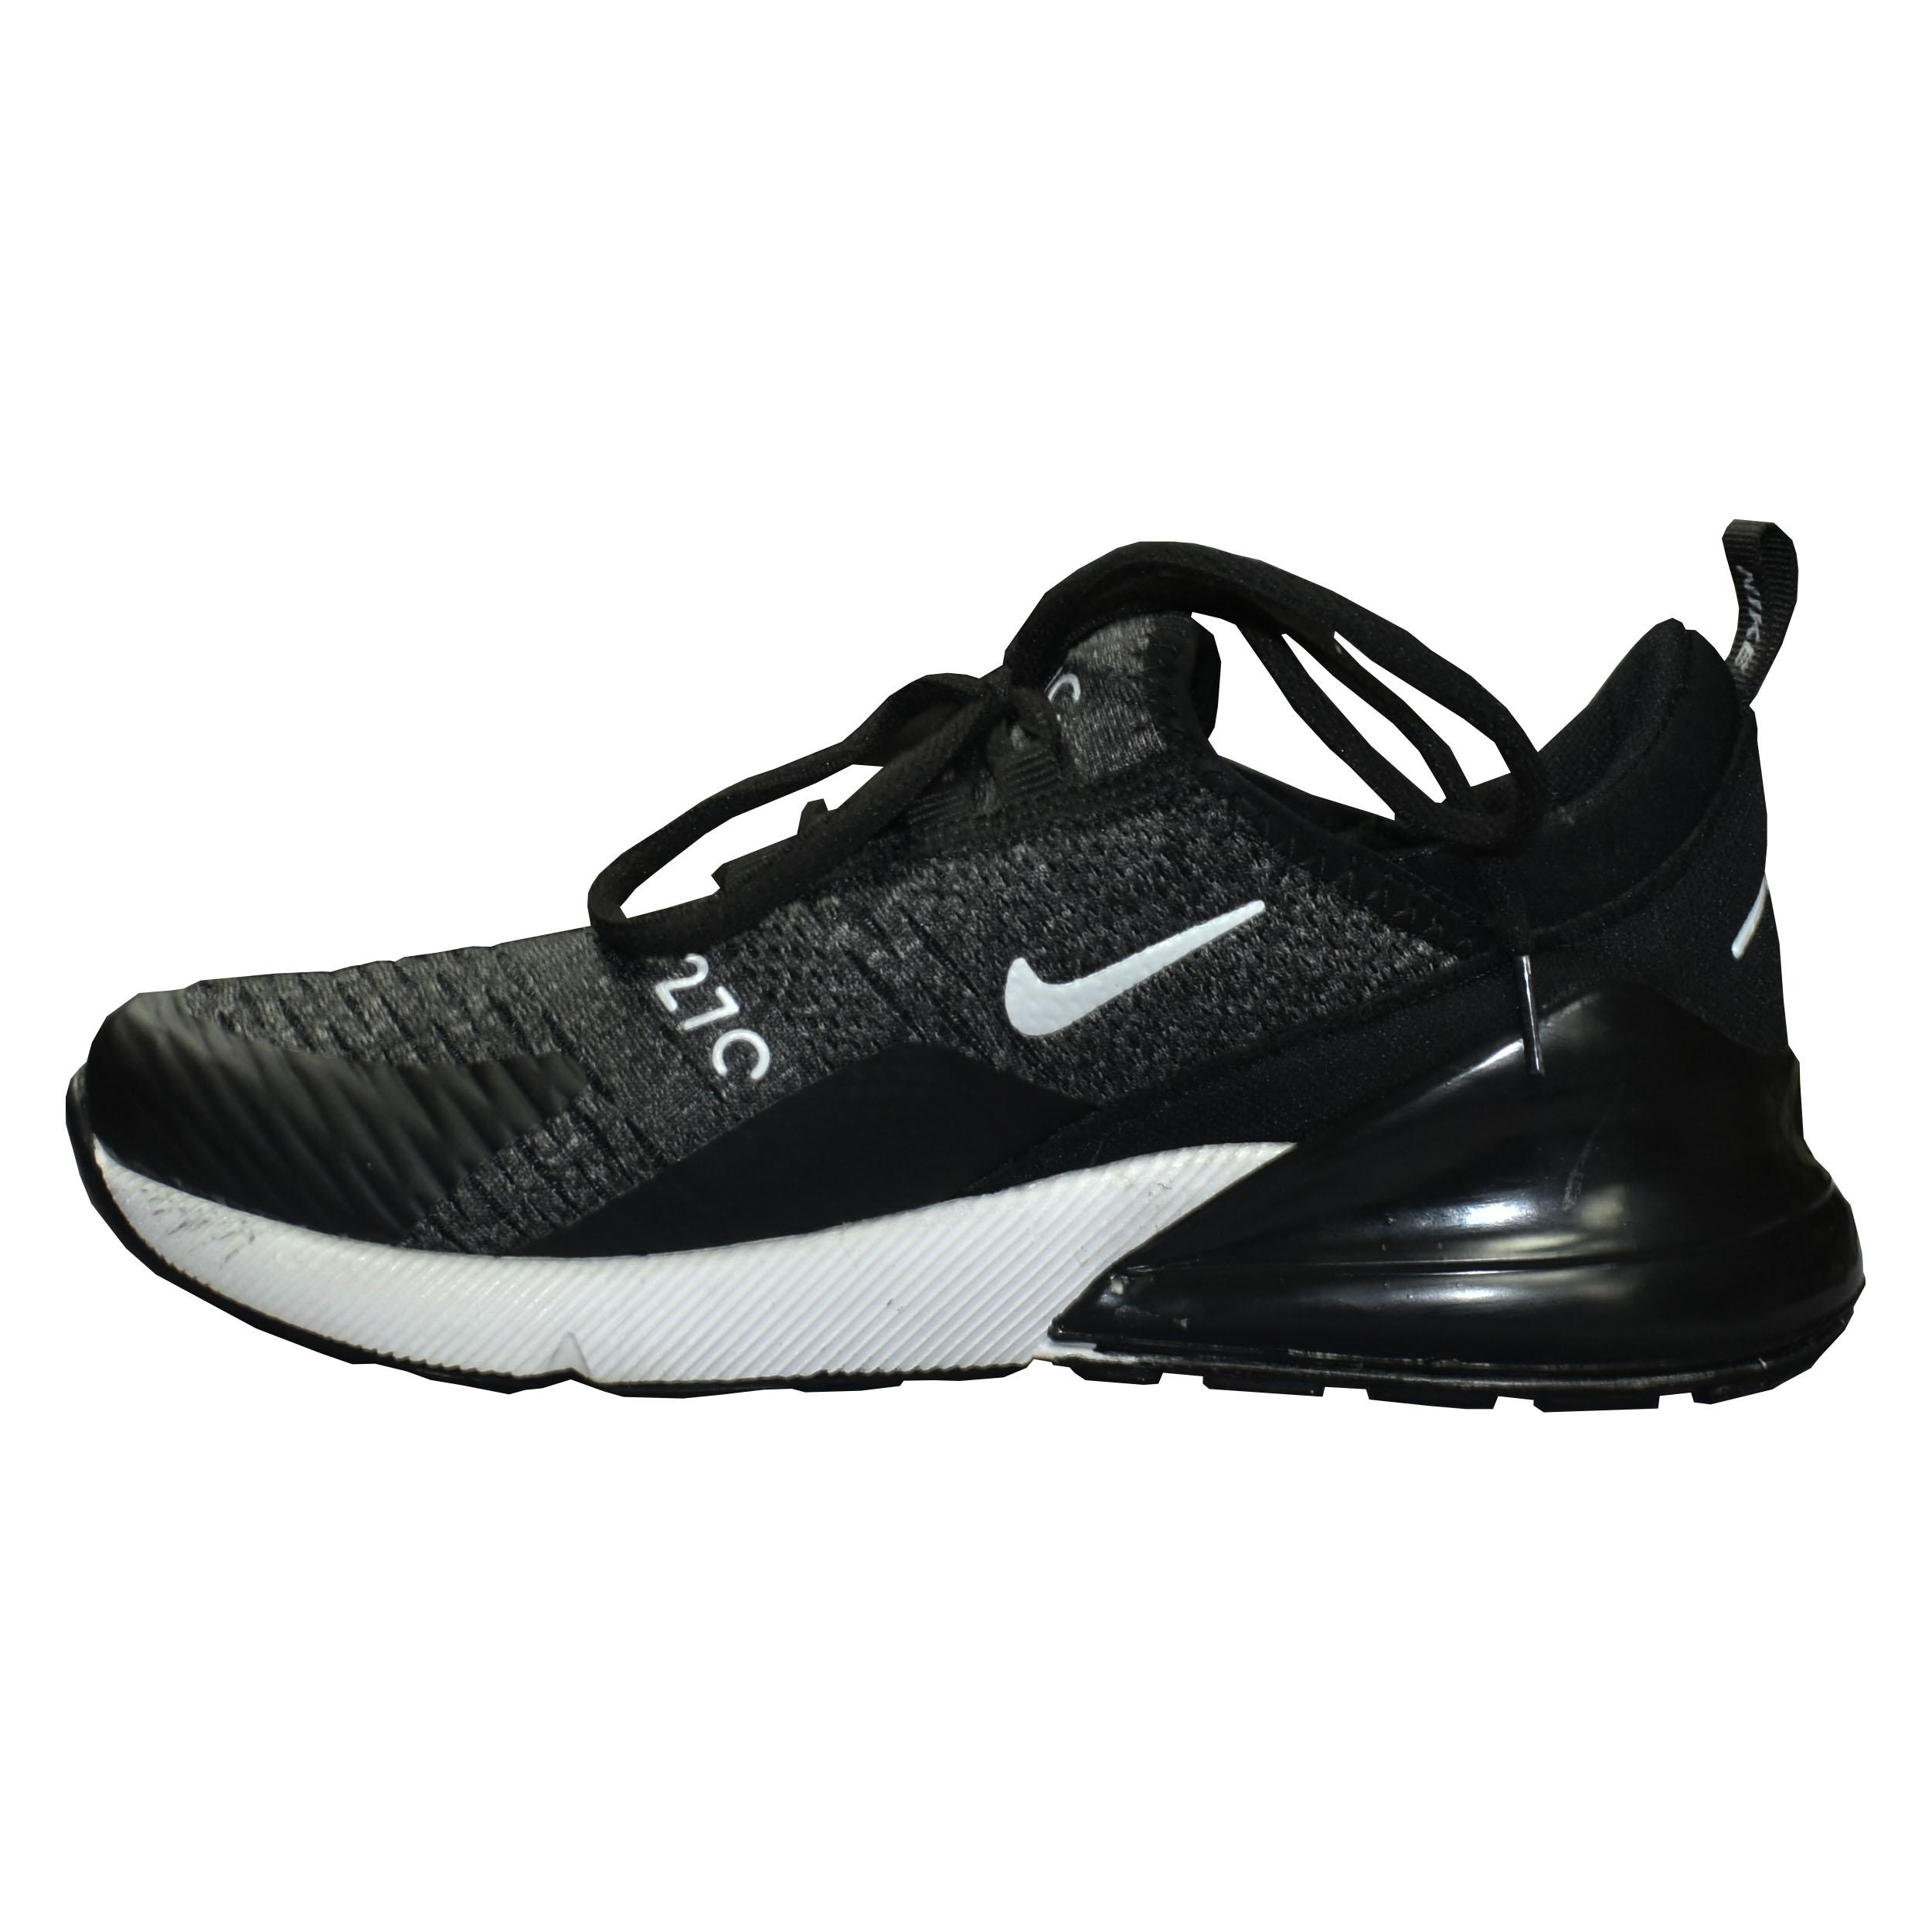 کفش مردانه نایک مدل H-uasasauih